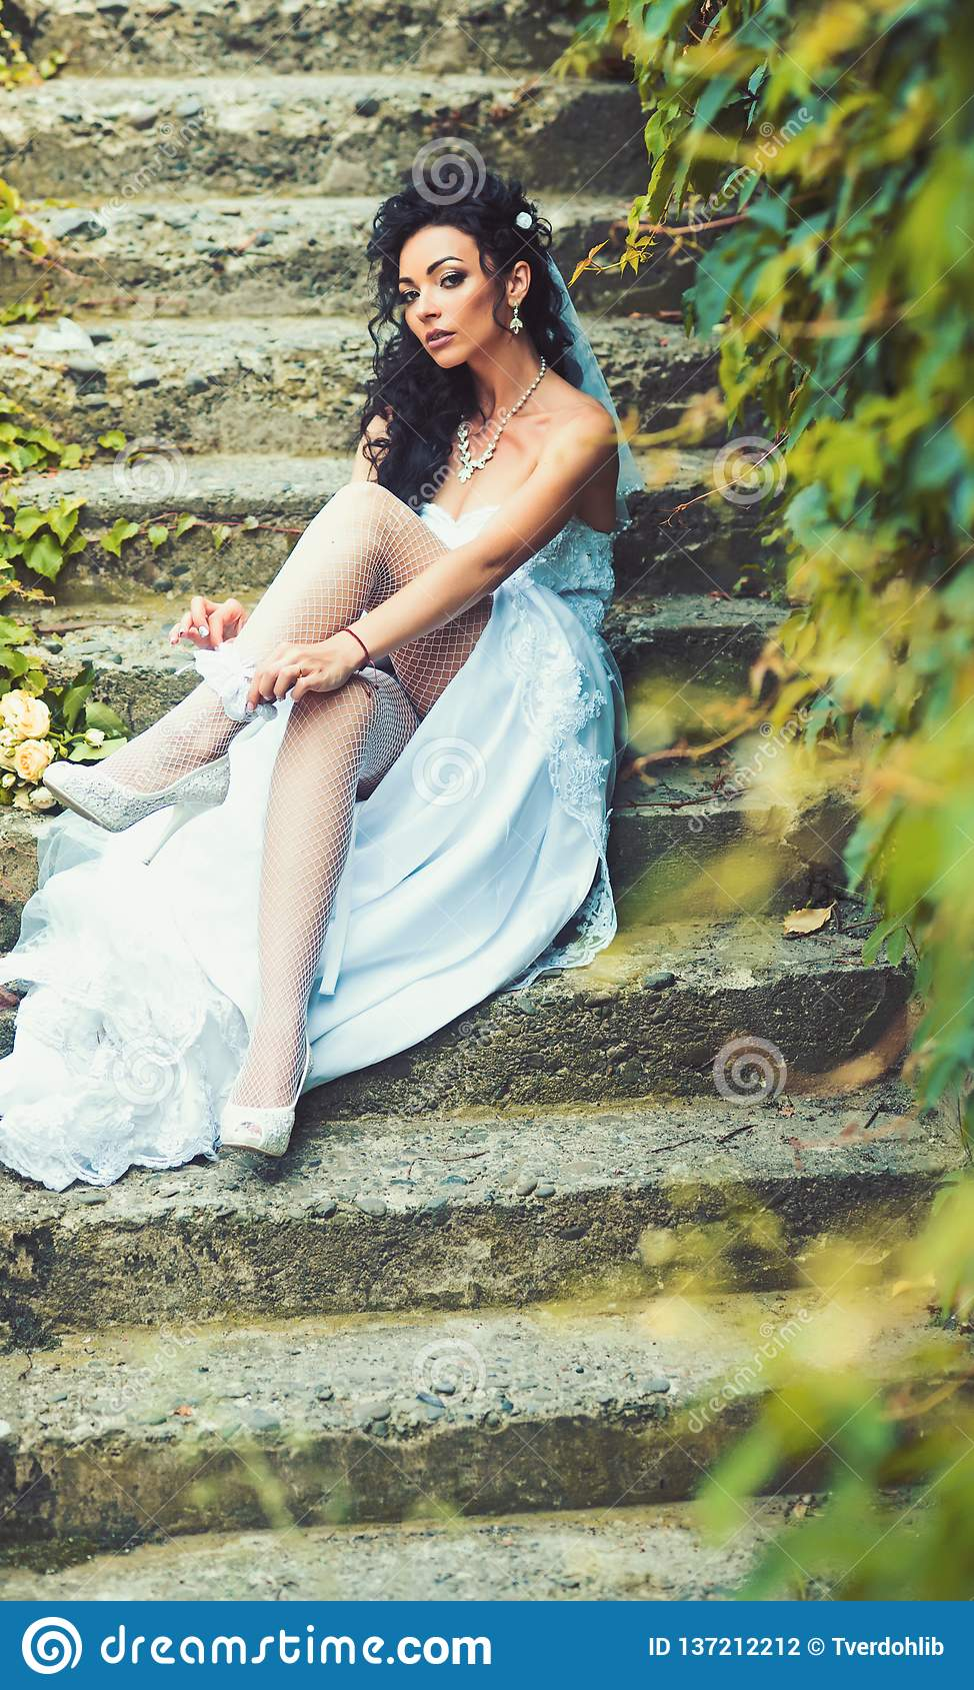 https://thumbs.dreamstime.com/z/girl-bridal-makeup-hairstyle-woman-wear-lace-garter-leg-sexy-stockings-lingerie-wedding-day-bride-white-dress-sit-137212212.jpg